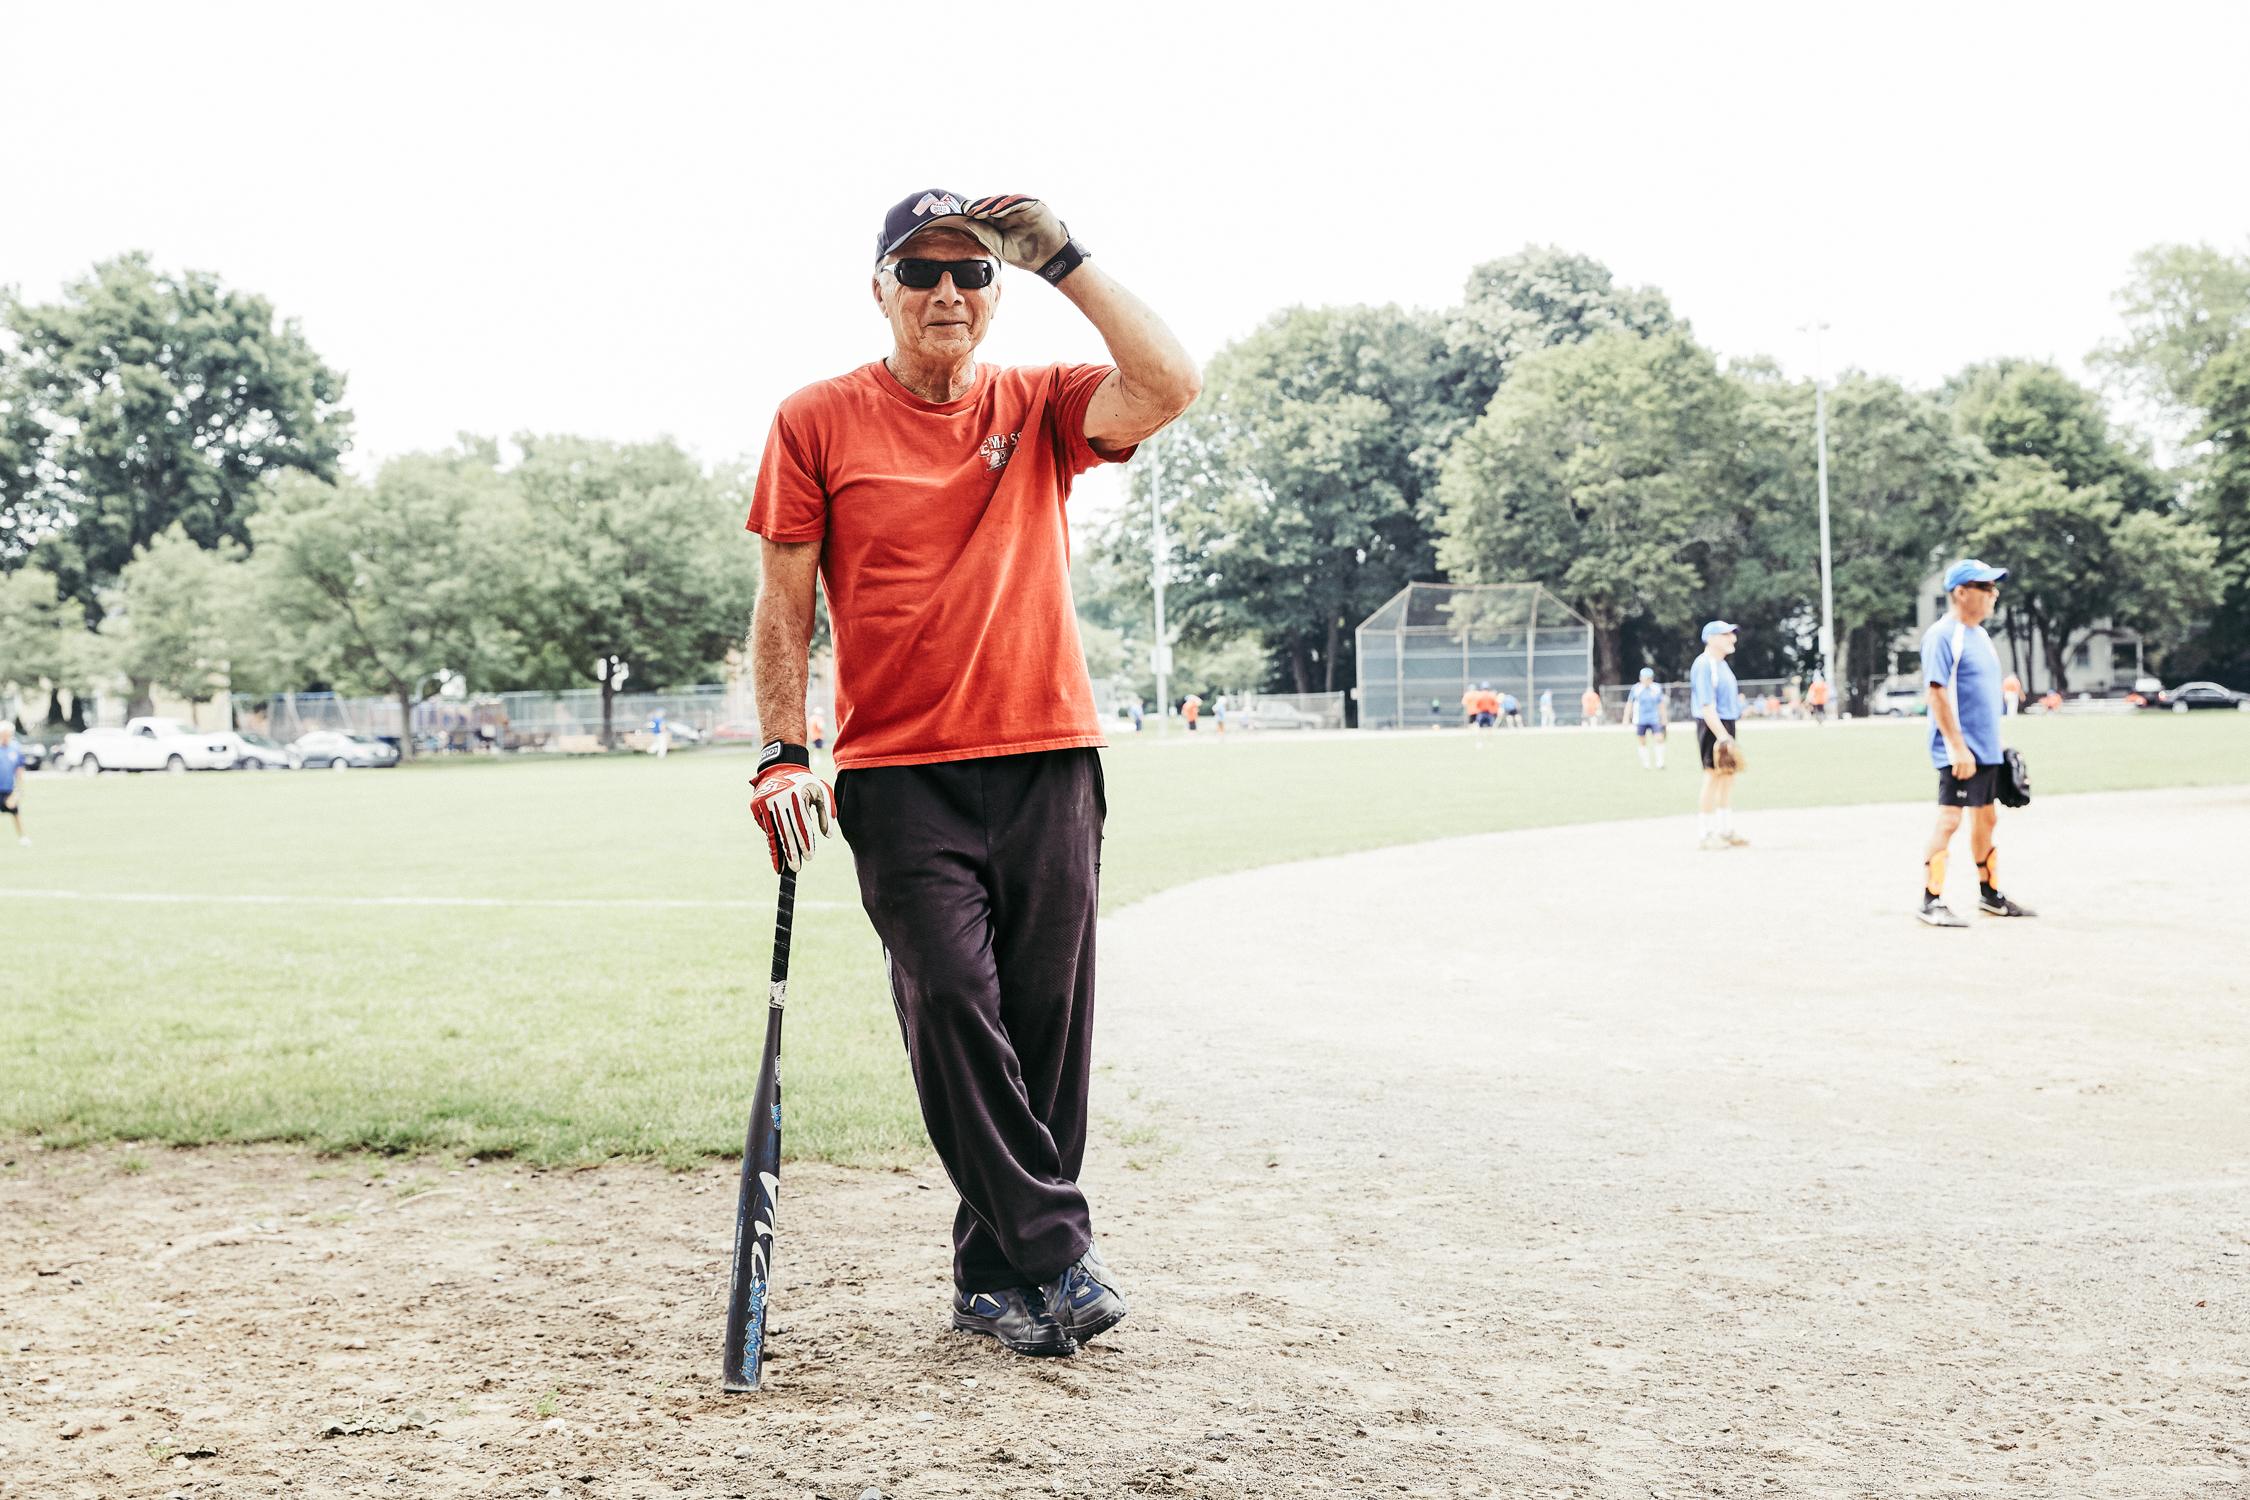 softball_8.jpg